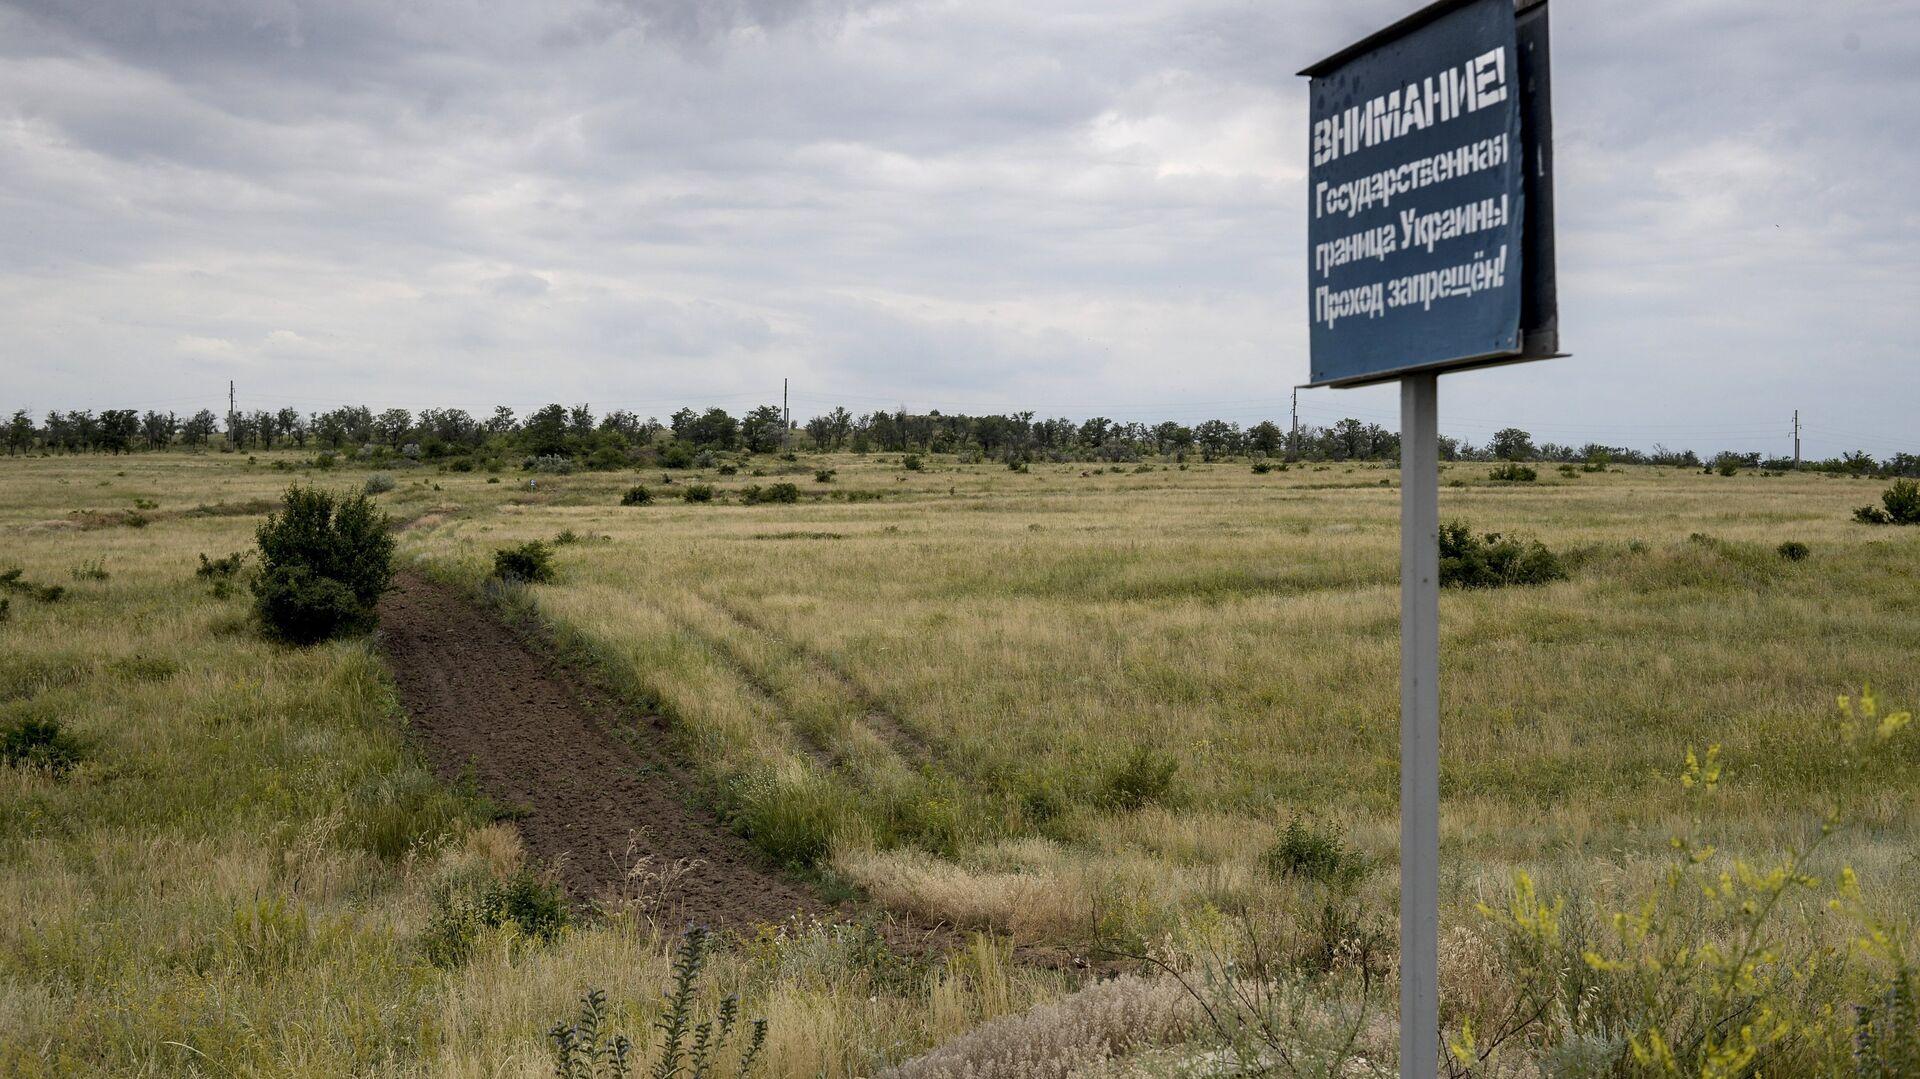 Frontera entre Rusia y Ucrania - Sputnik Mundo, 1920, 07.04.2021